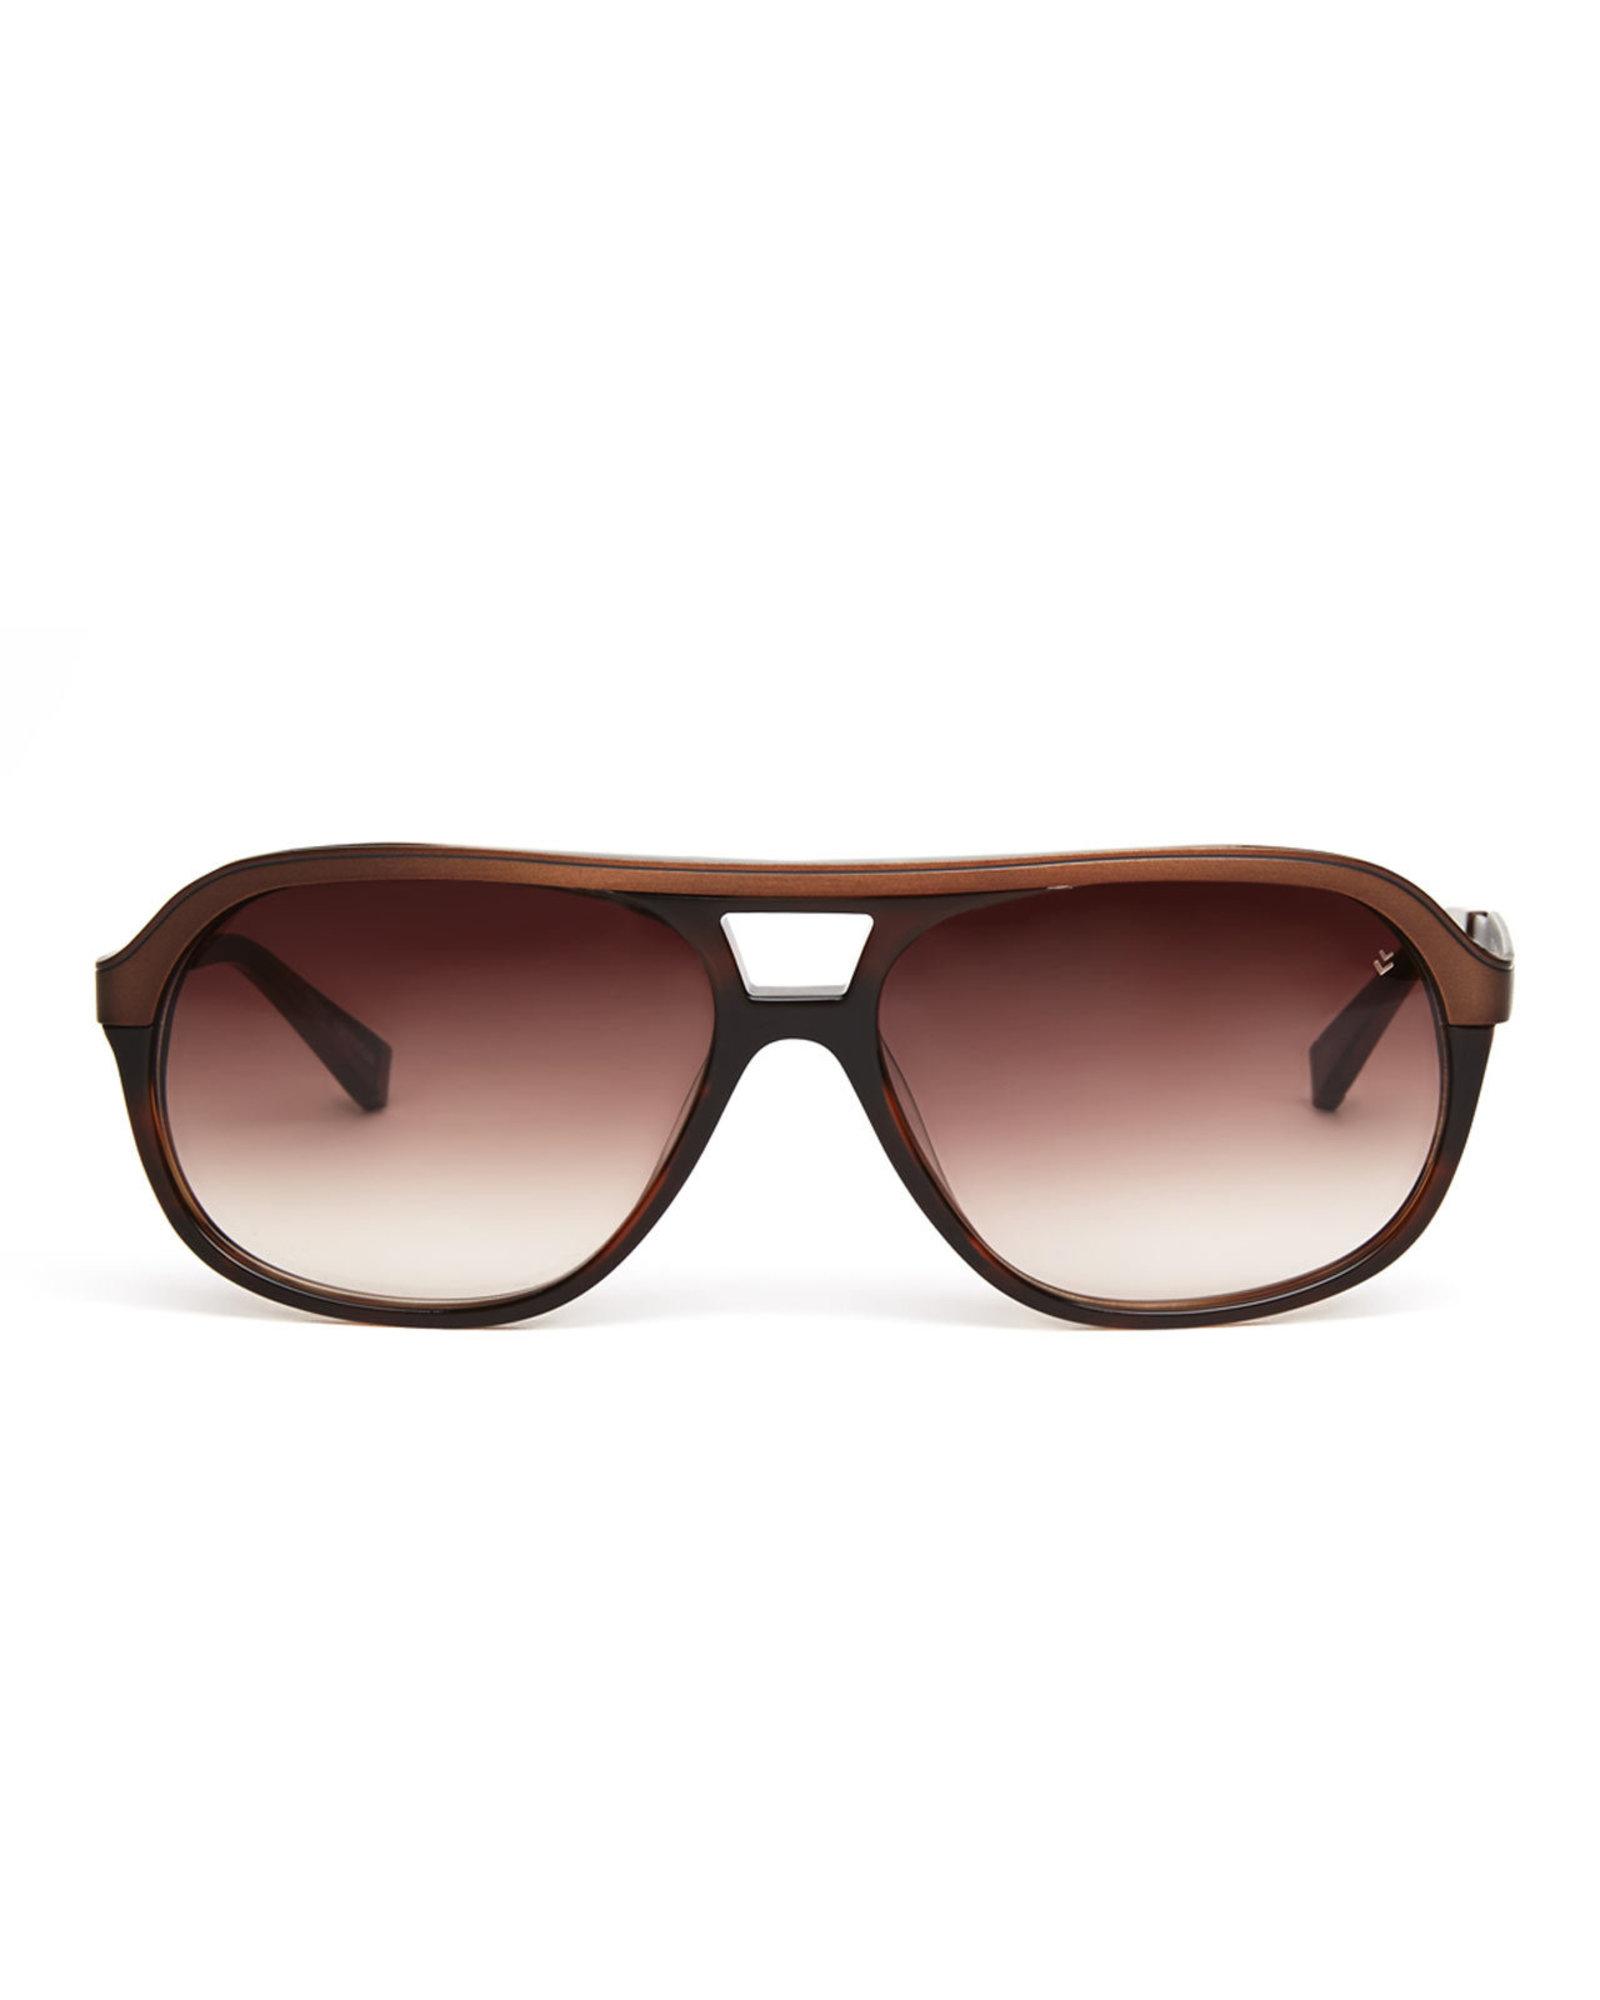 John Varvatos V767 Brown Horn Aviator Sunglasses In Brown